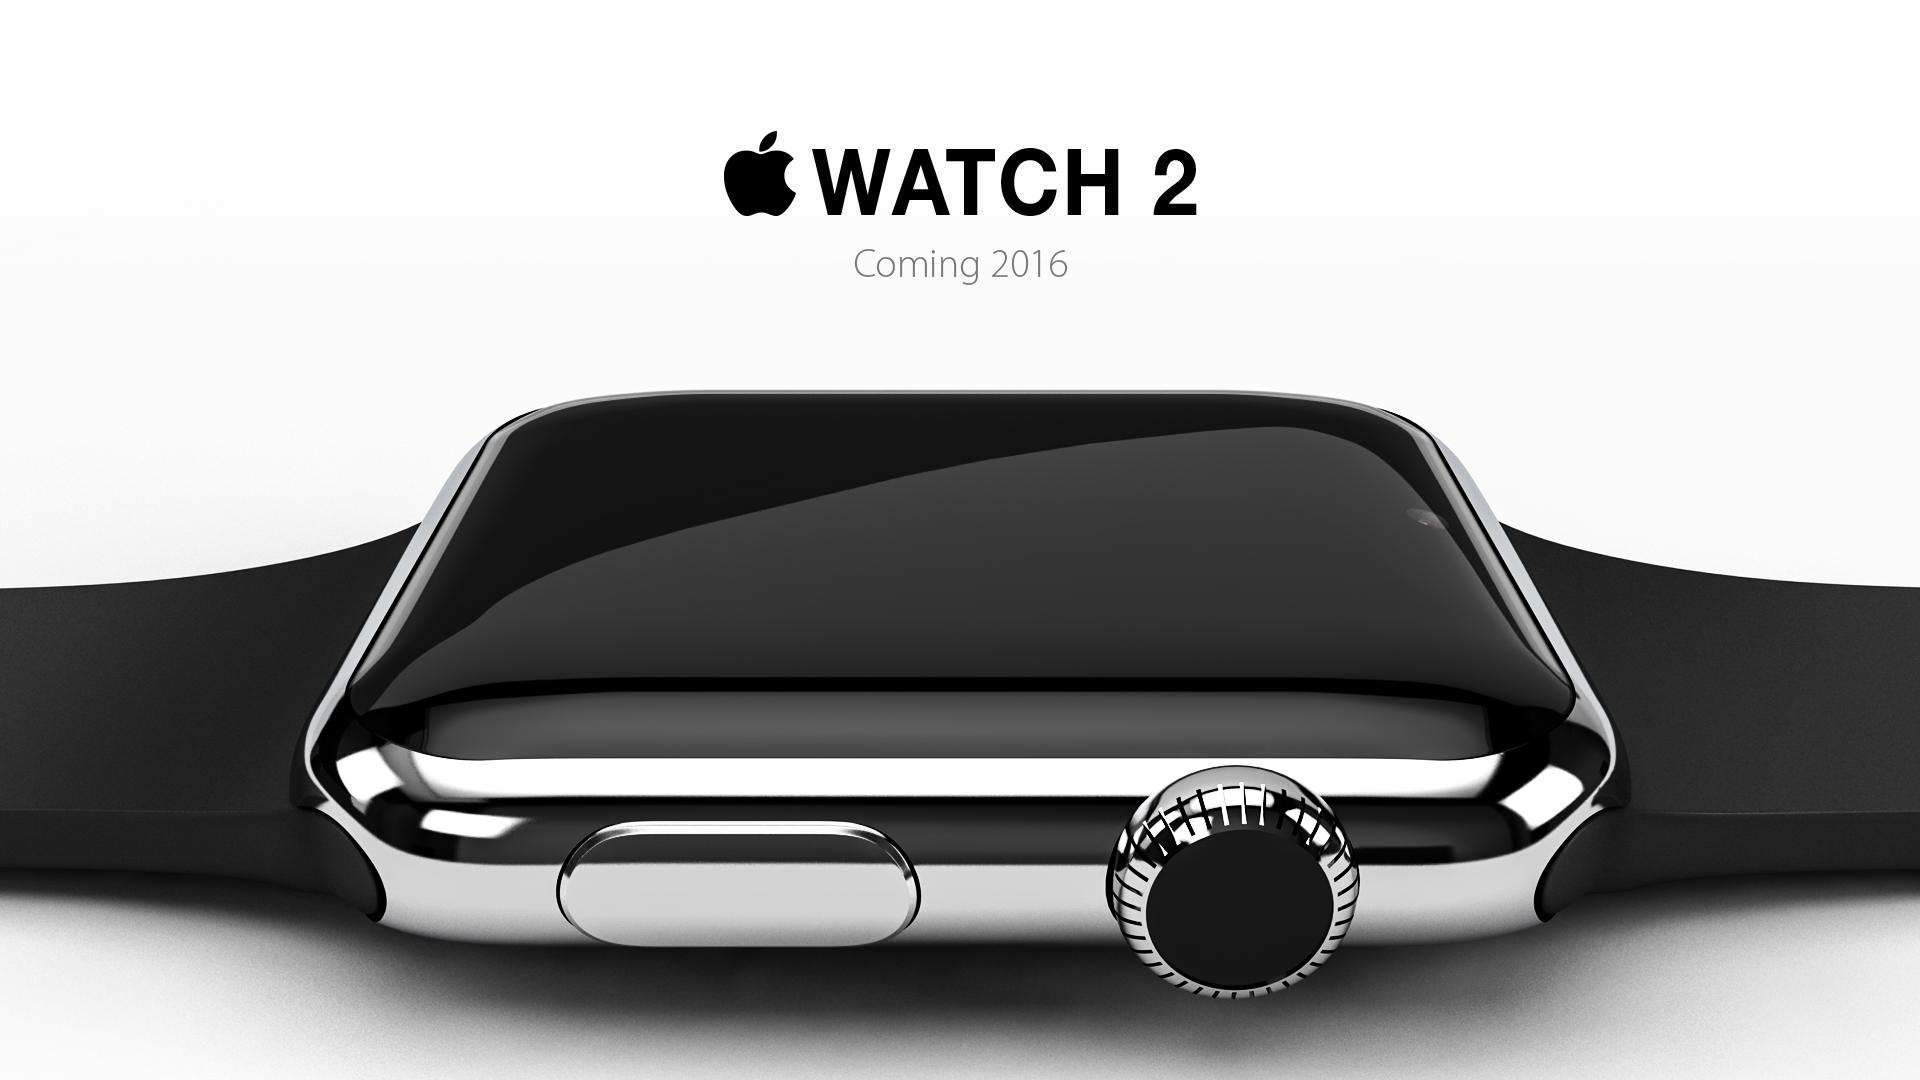 Apple Watch 2, un concept che affascina